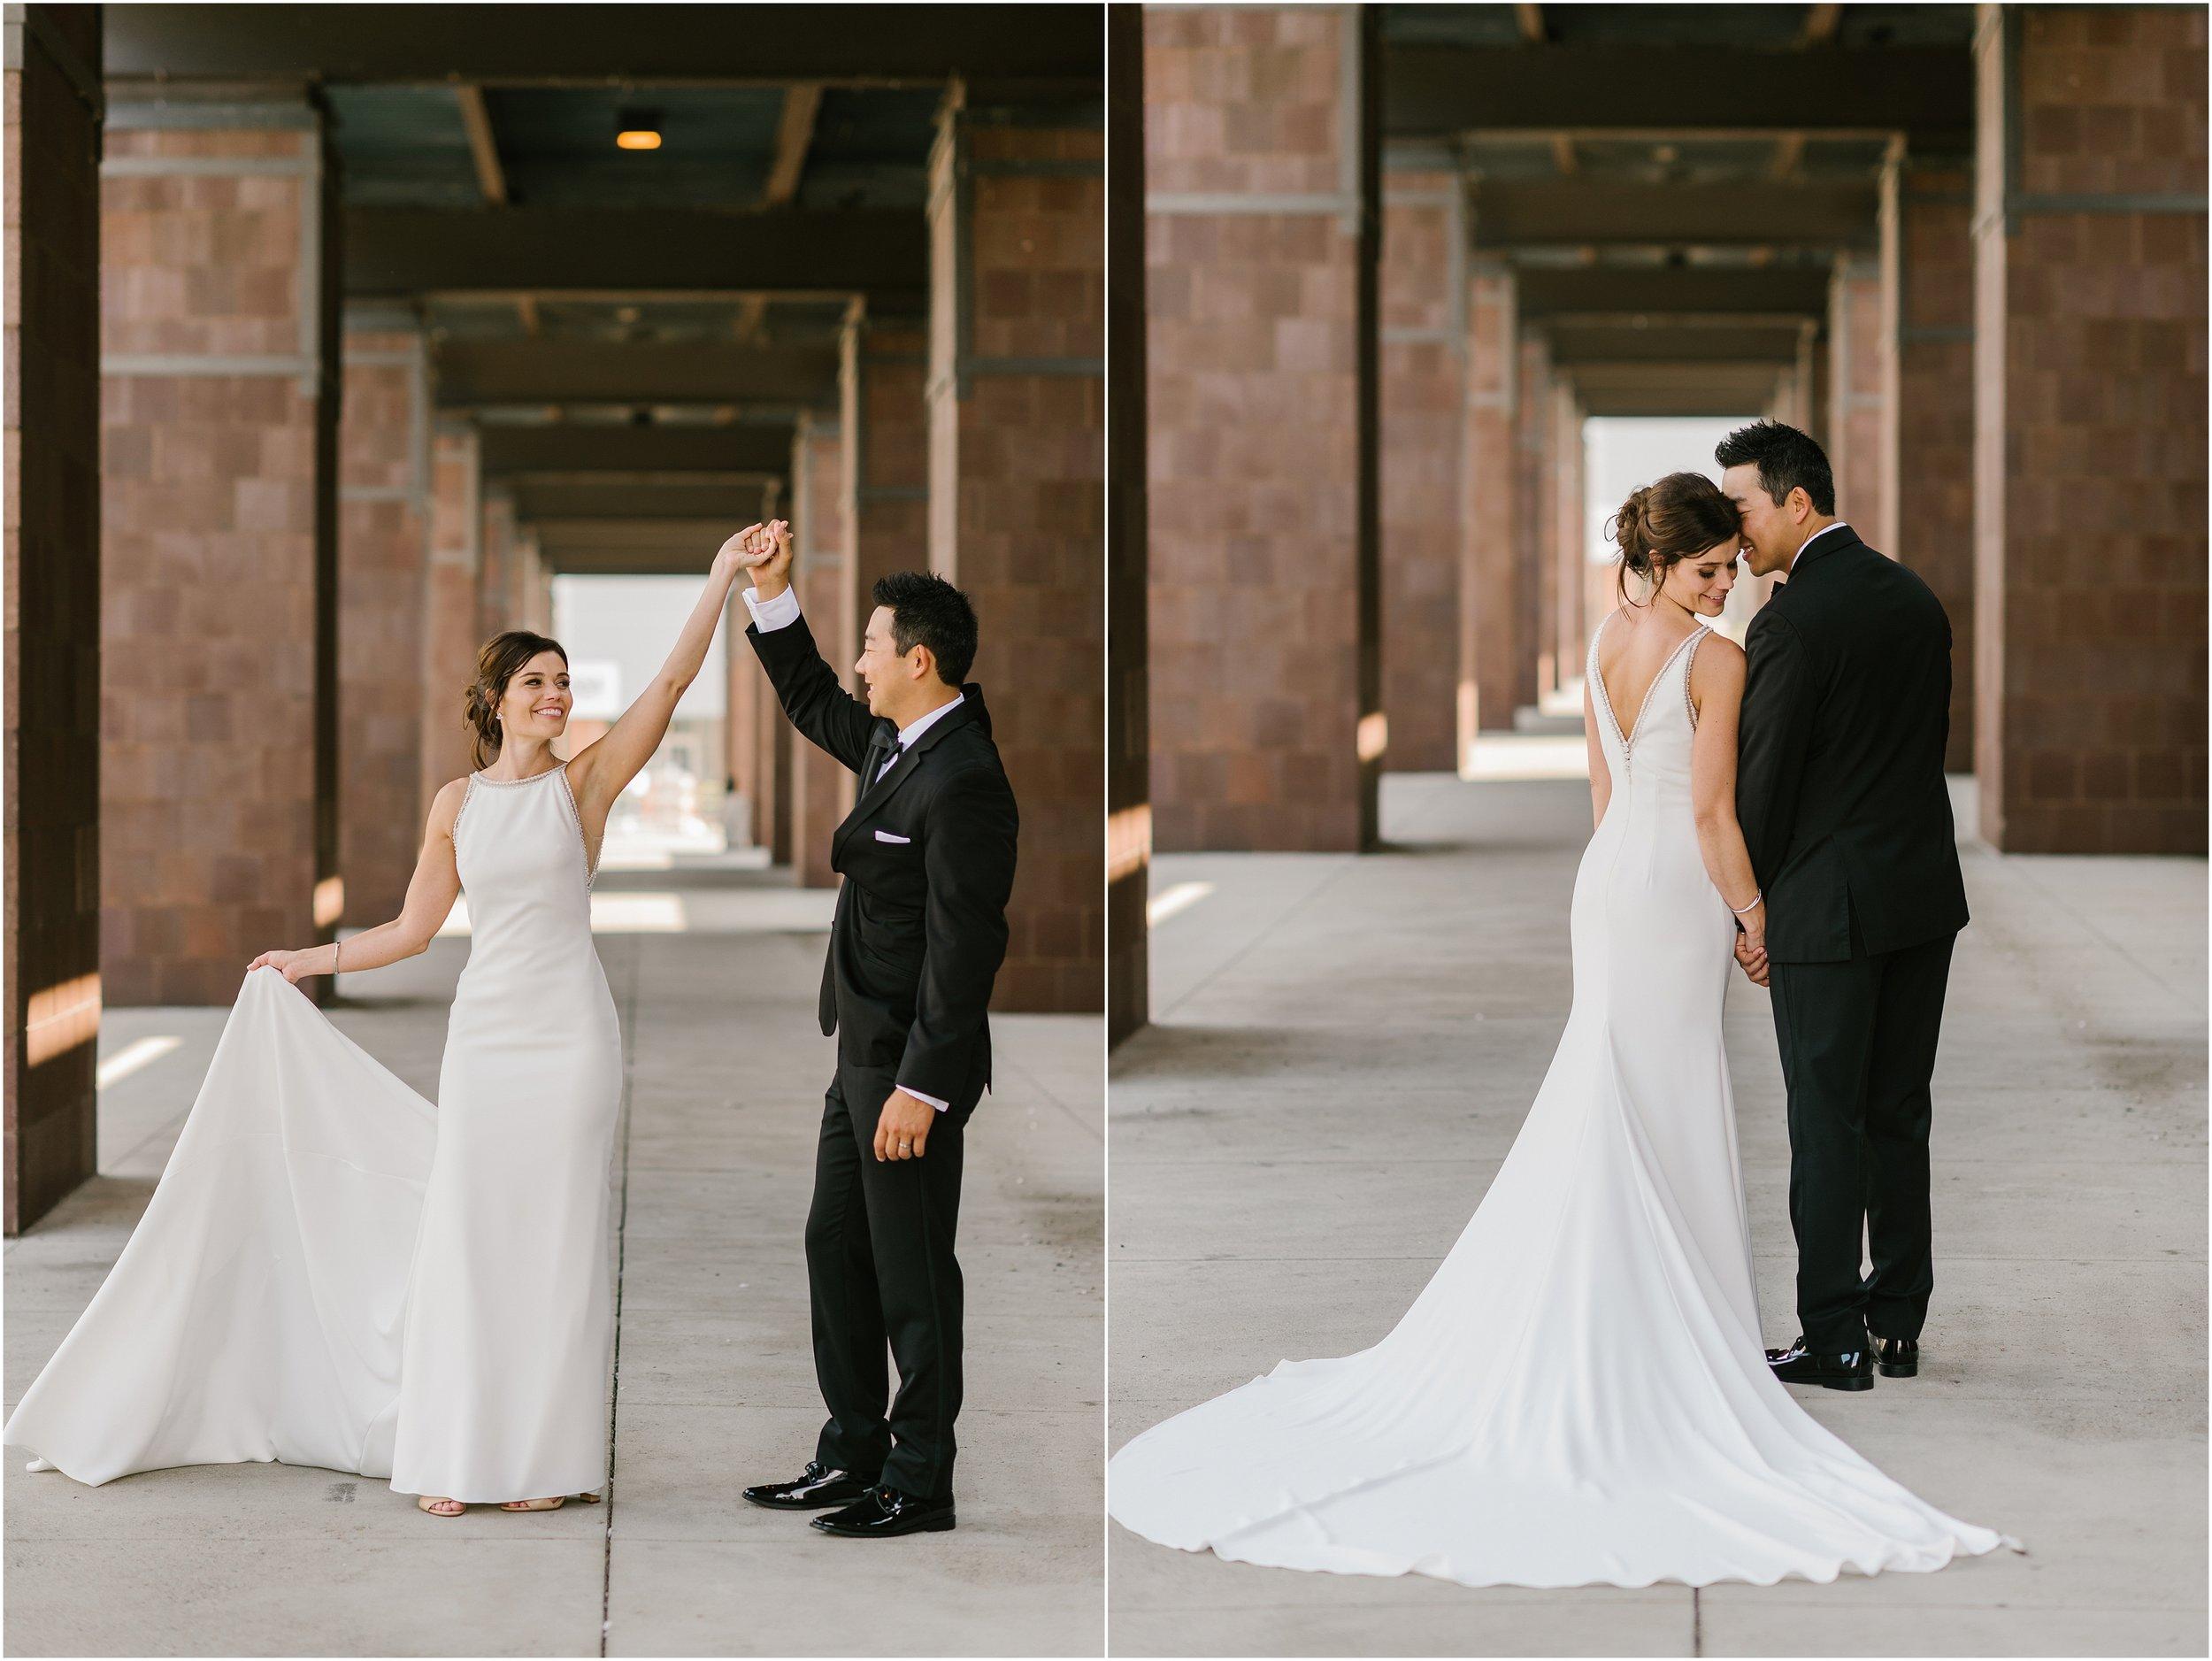 Rebecca_Shehorn_Photography_Indianapolis Wedding Photographer Sycamore at Mallow Run Wedding_9750.jpg